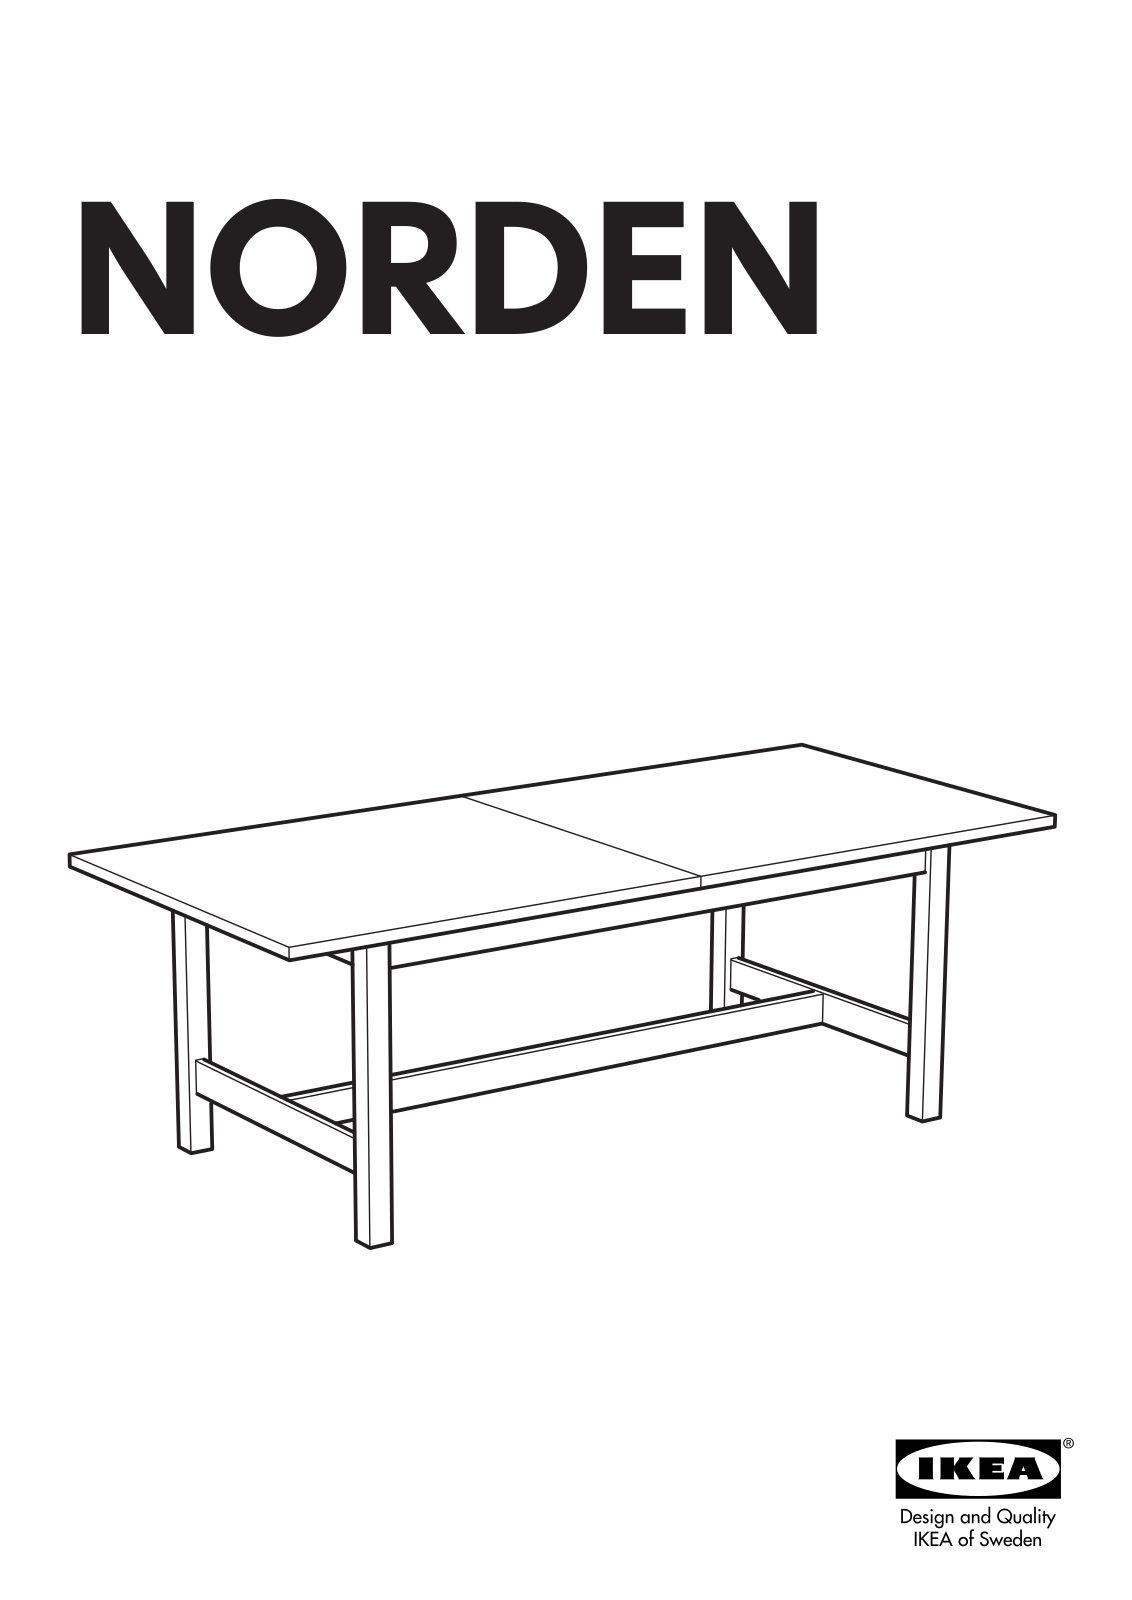 Ikea Norden 220x100x75 266x100x75 Dining Table 87 105x39 User Manual